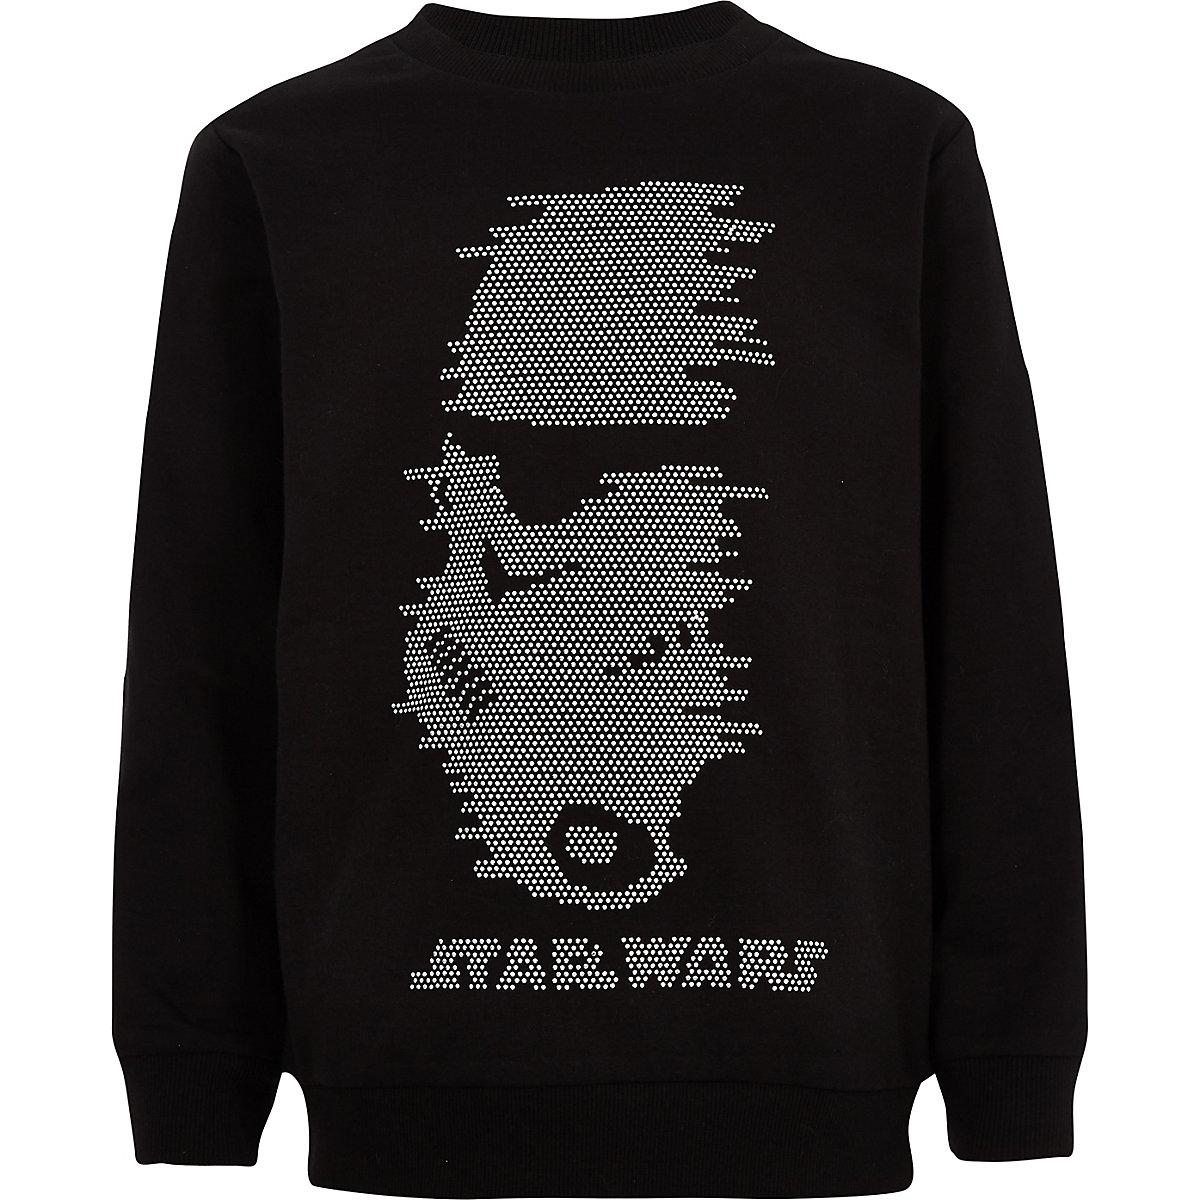 Boys Star Wars studded sweatshirt